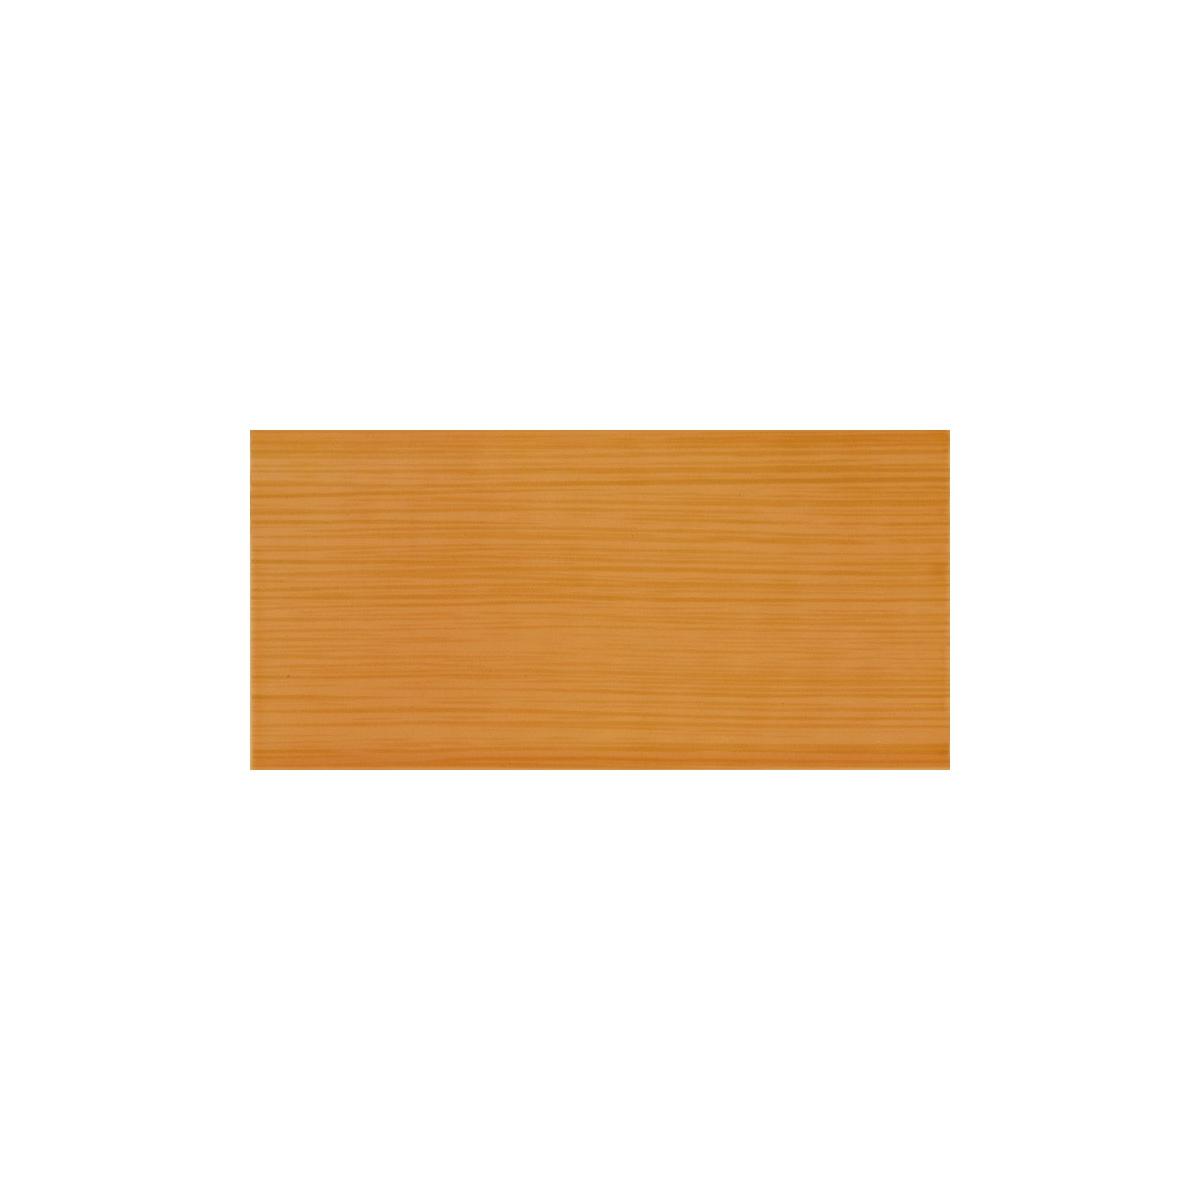 Glam Arancio (Caja de 1 m2)